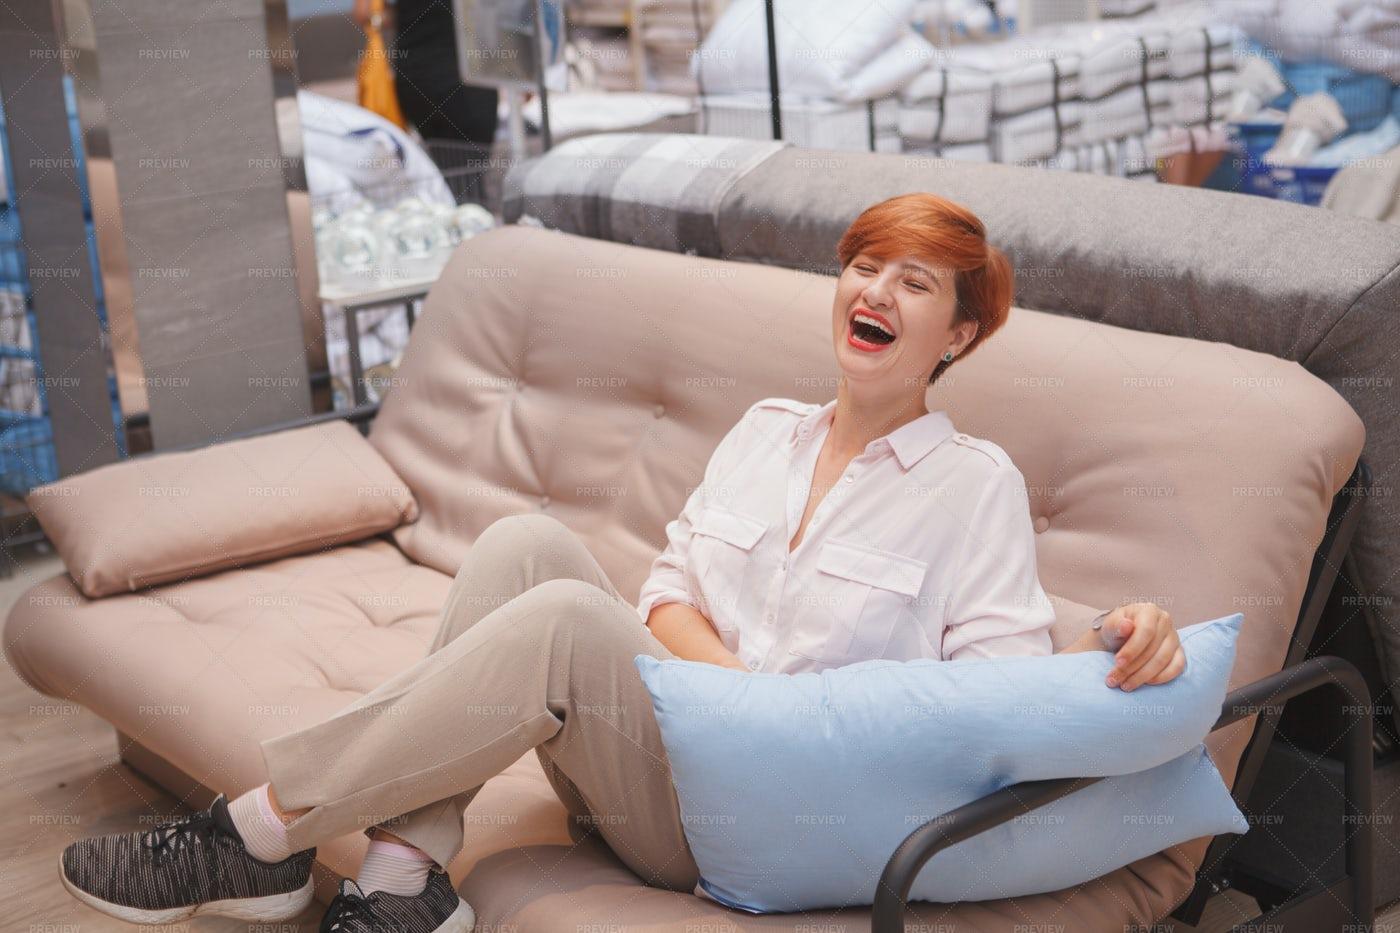 Happy Customer In Sofa: Stock Photos